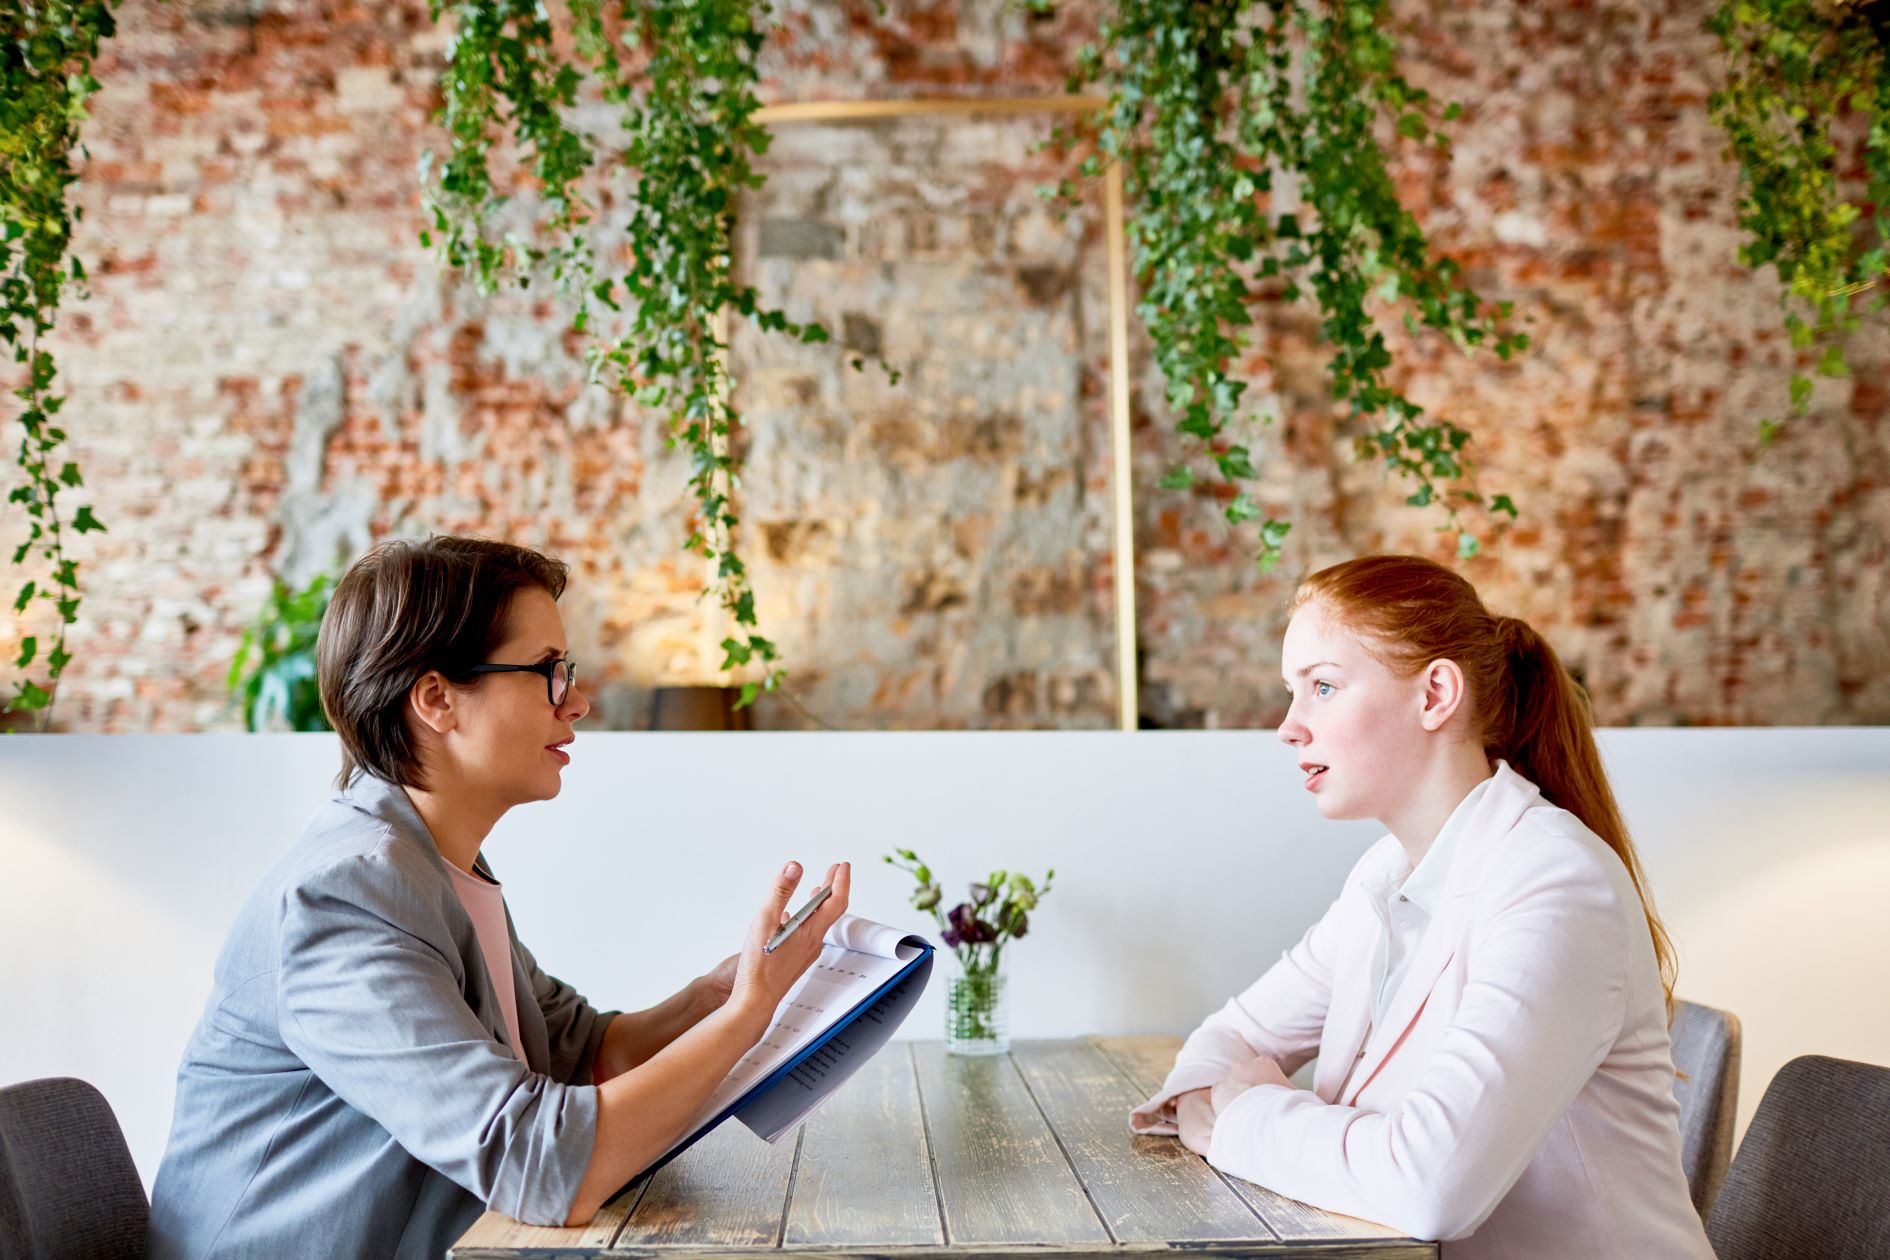 4 Hiring Tips to Help Improve Customer Service